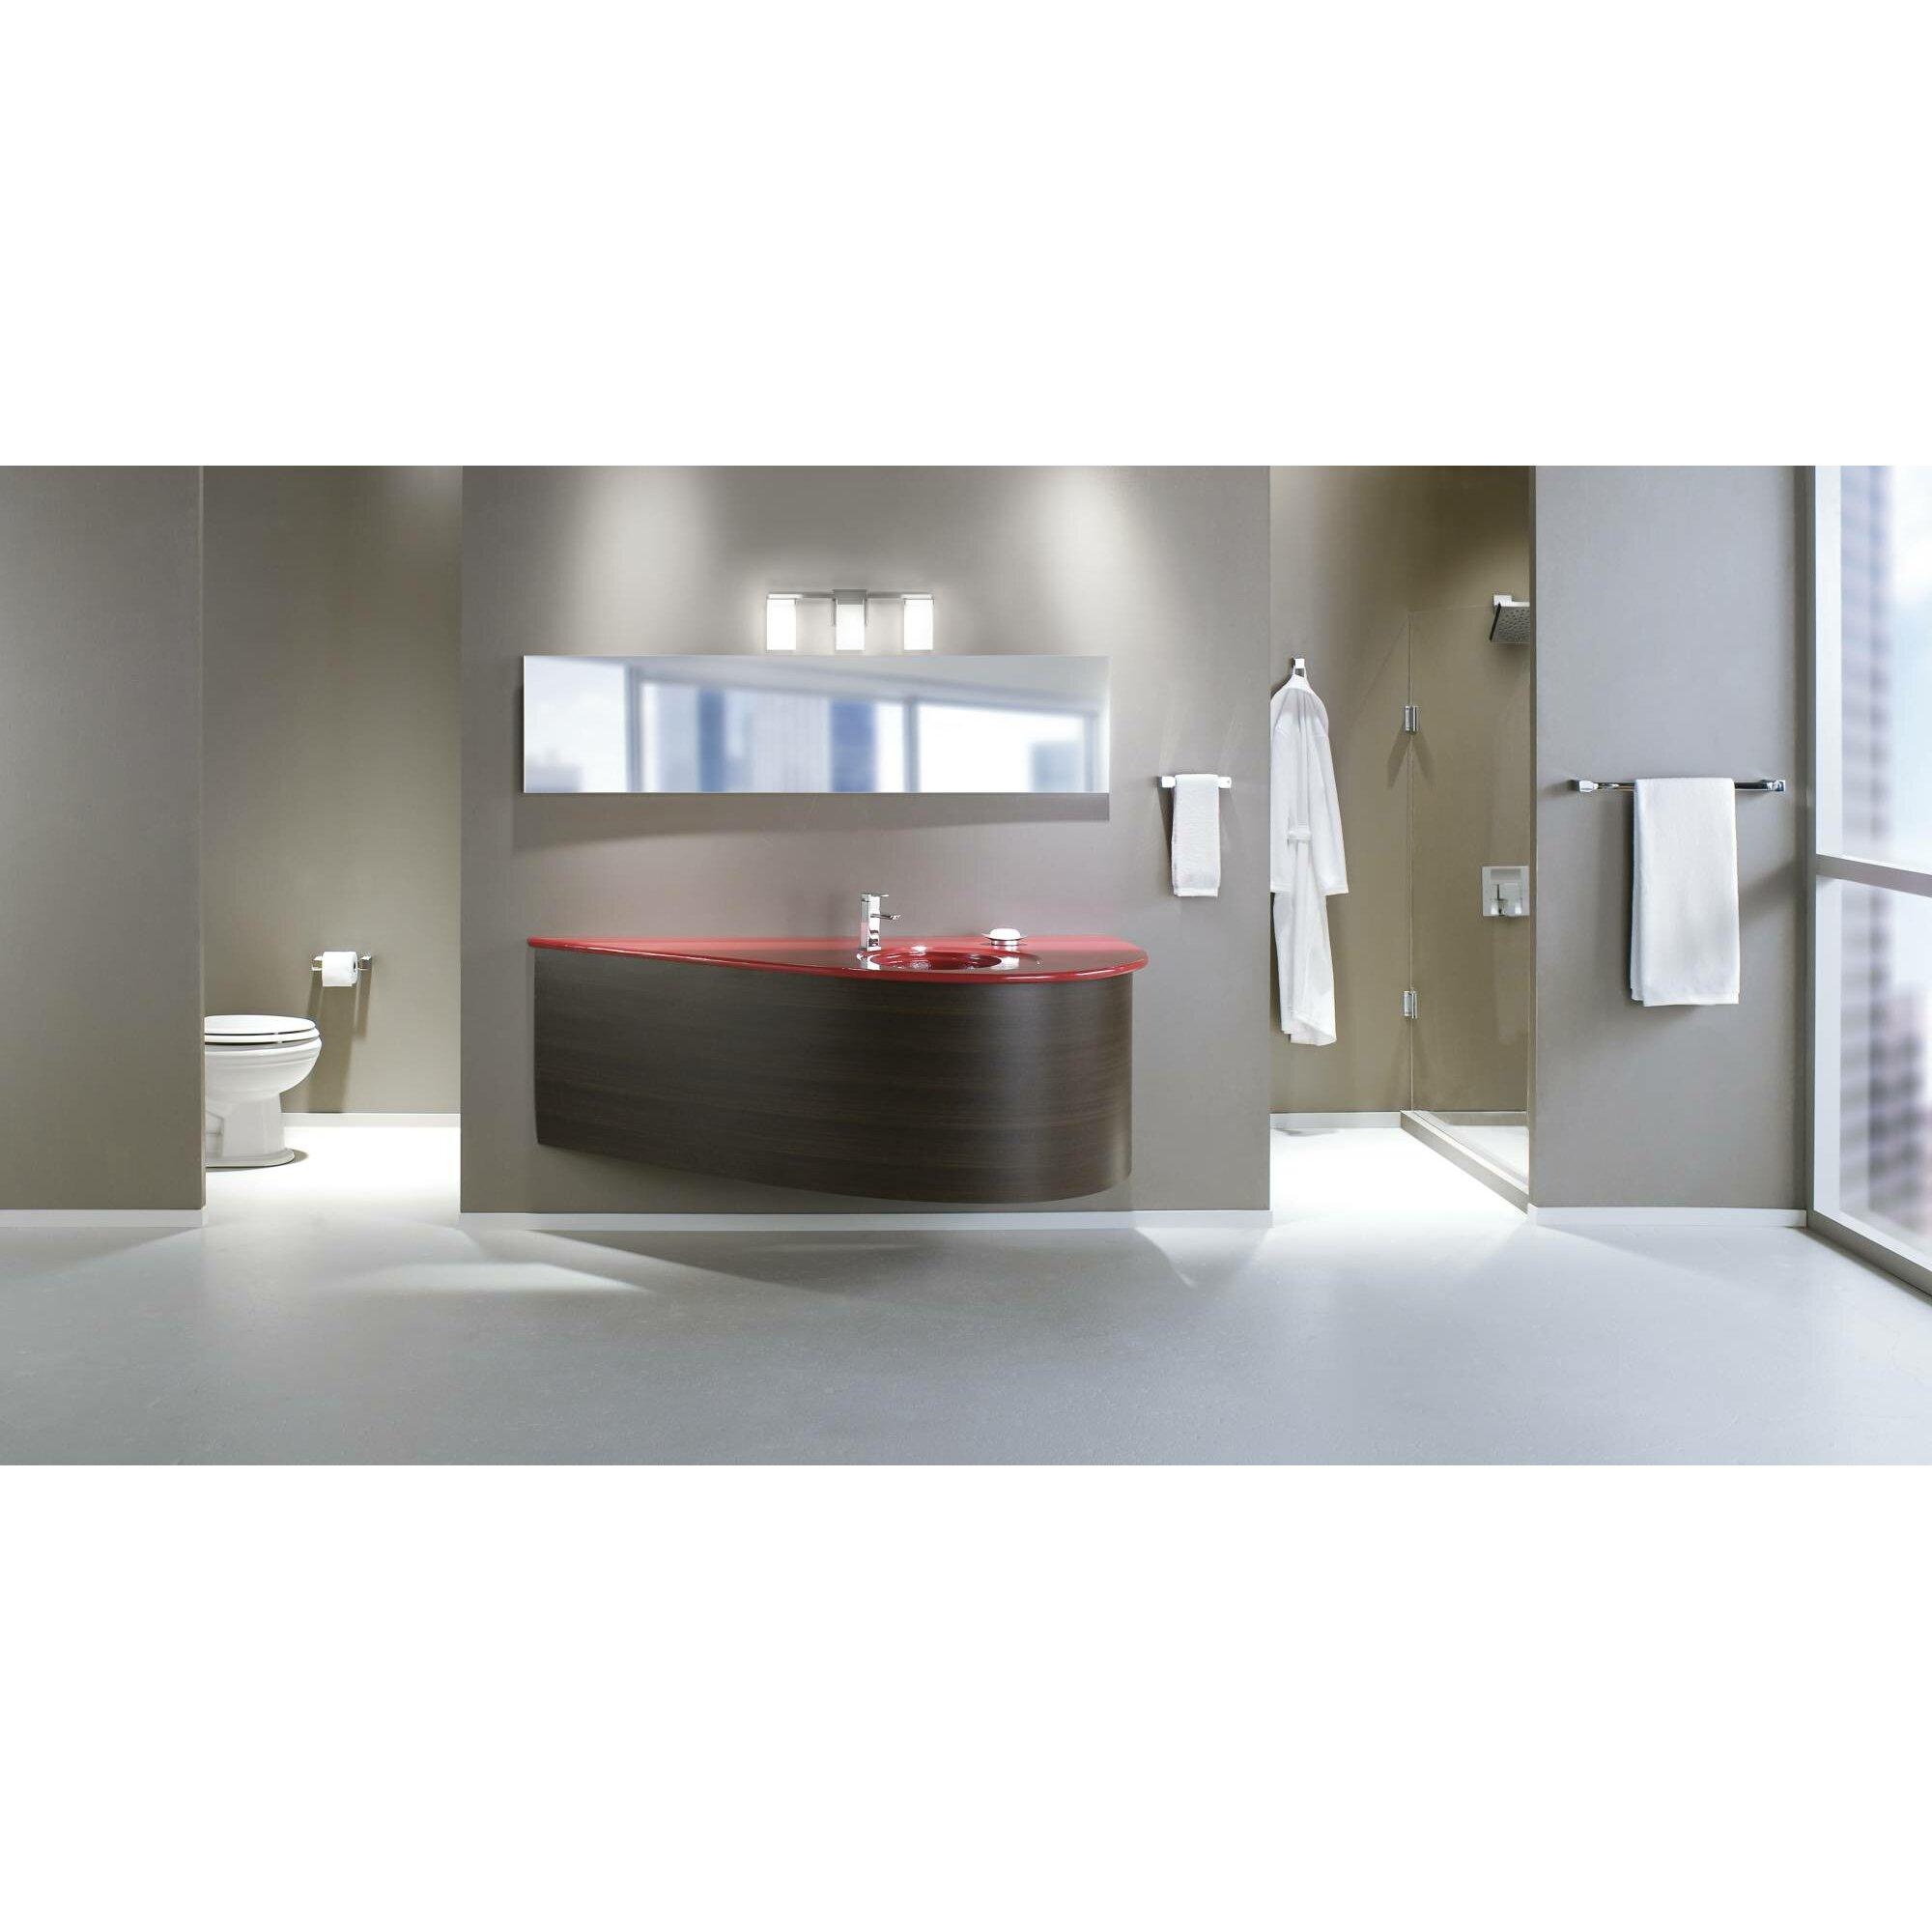 90 Bathroom Vanity Moen 90 Degree 3 Light Vanity Light Reviews Wayfair